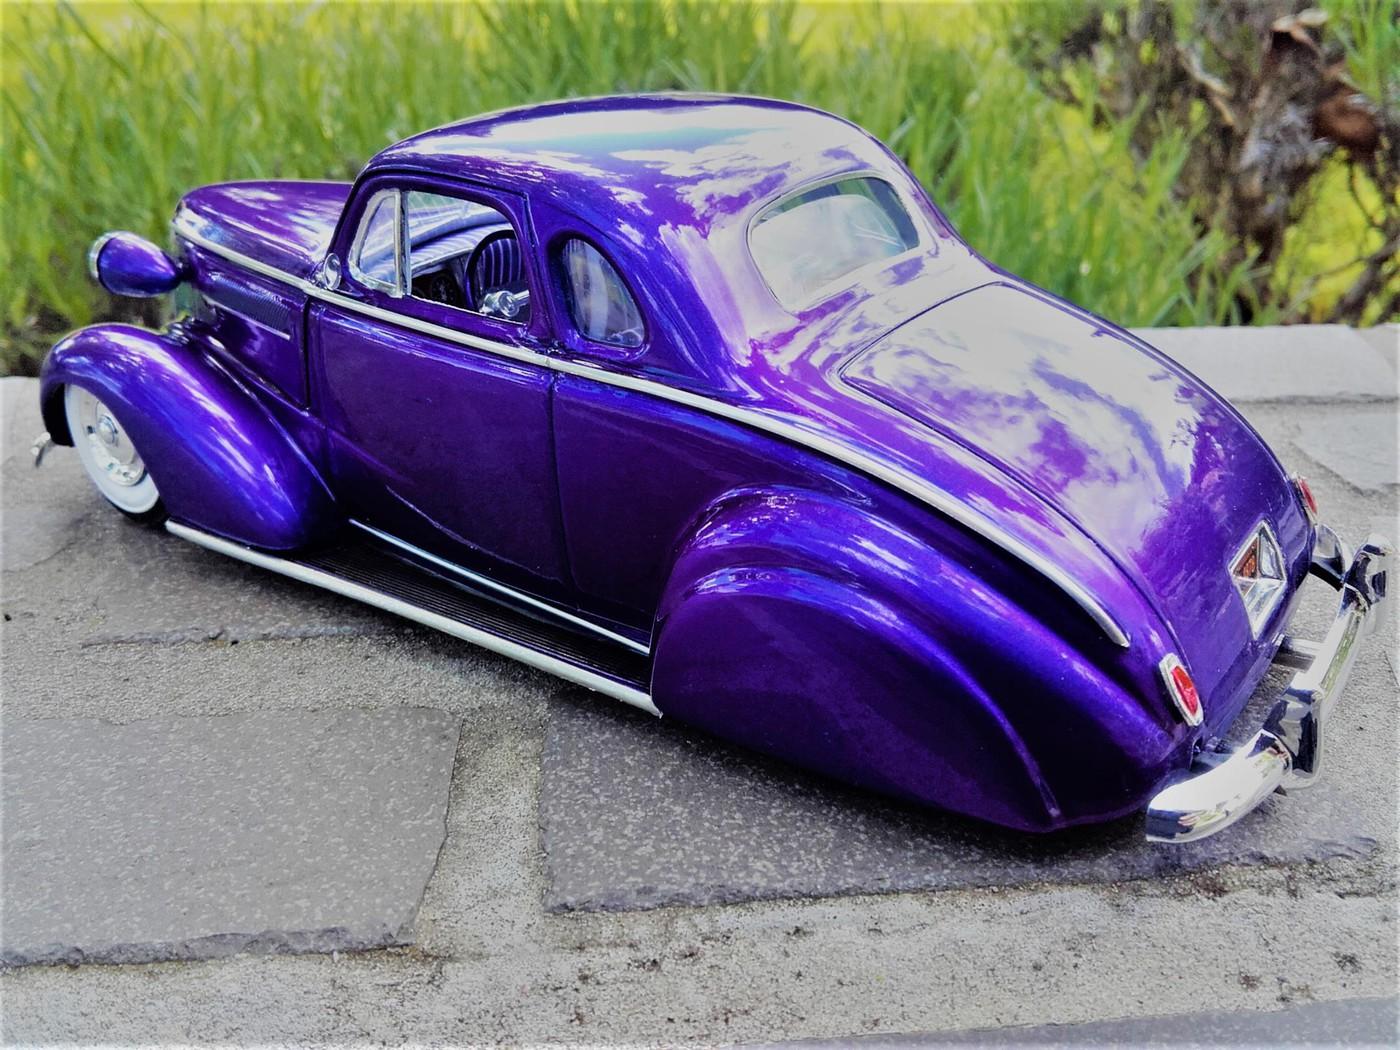 Projet Chevy 37 custom terminée  - Page 2 Photo28-vi